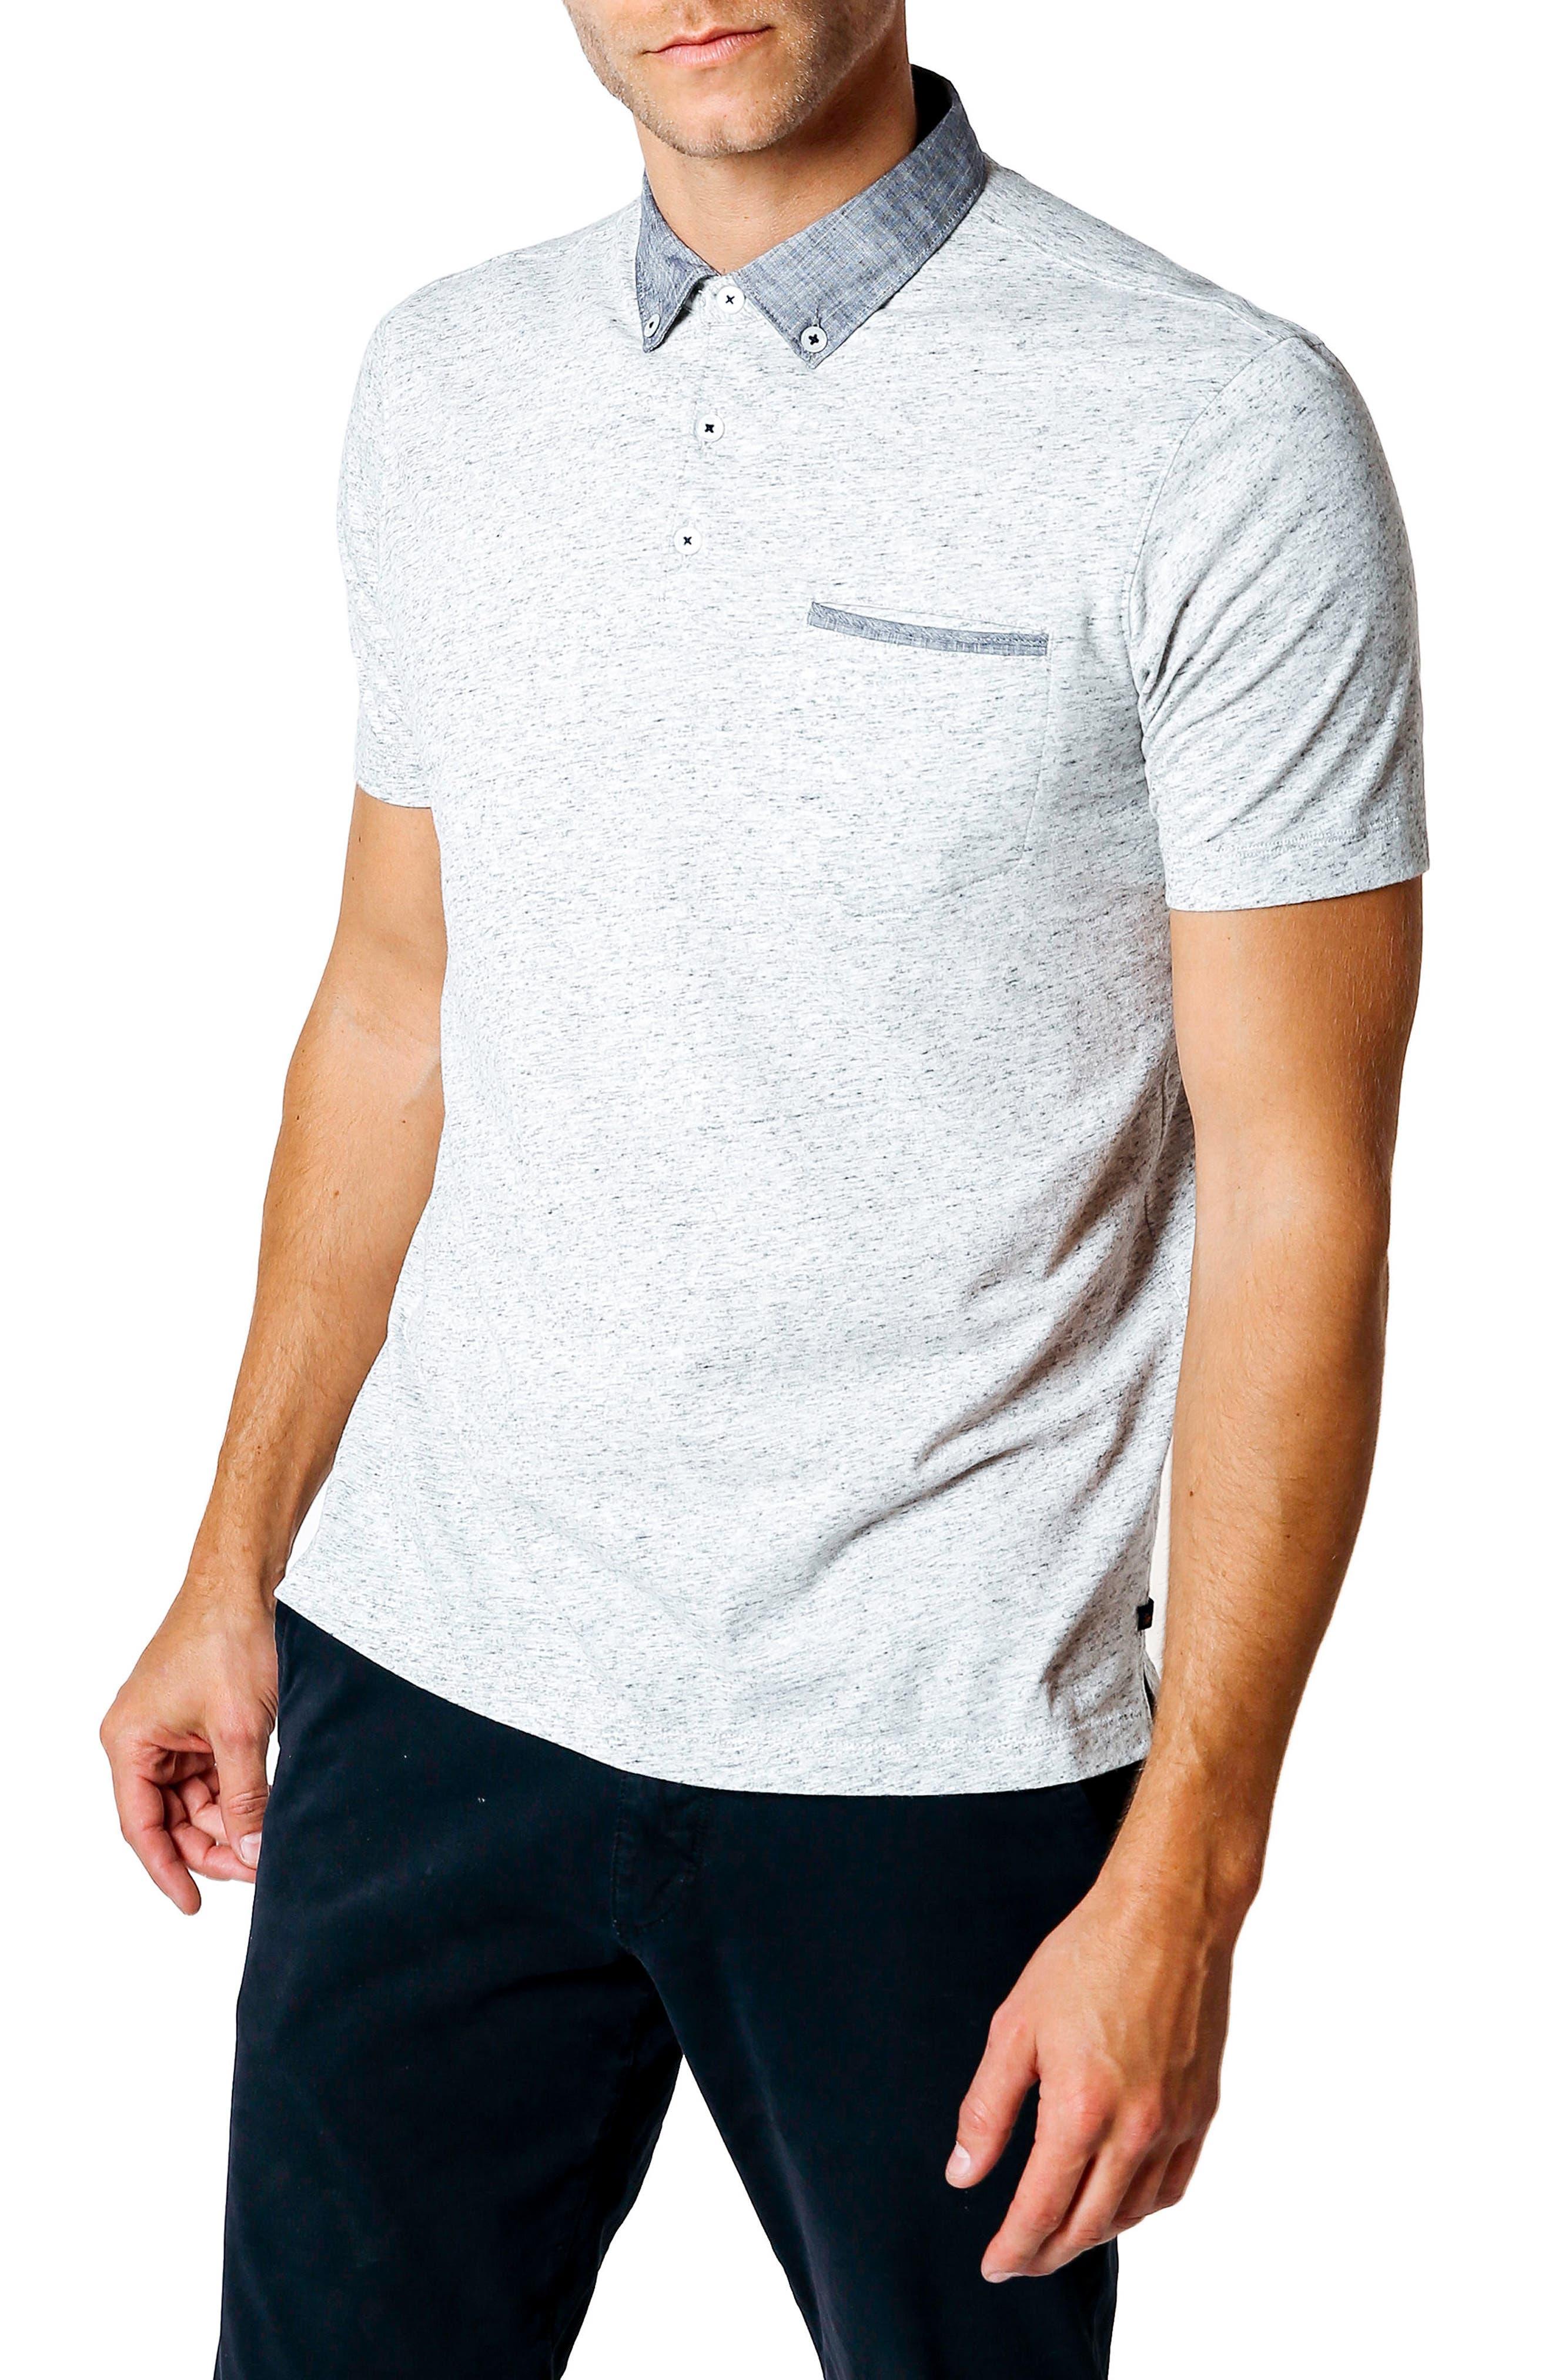 GOOD MAN BRAND,                             Trim Fit Polo Shirt,                             Main thumbnail 1, color,                             030